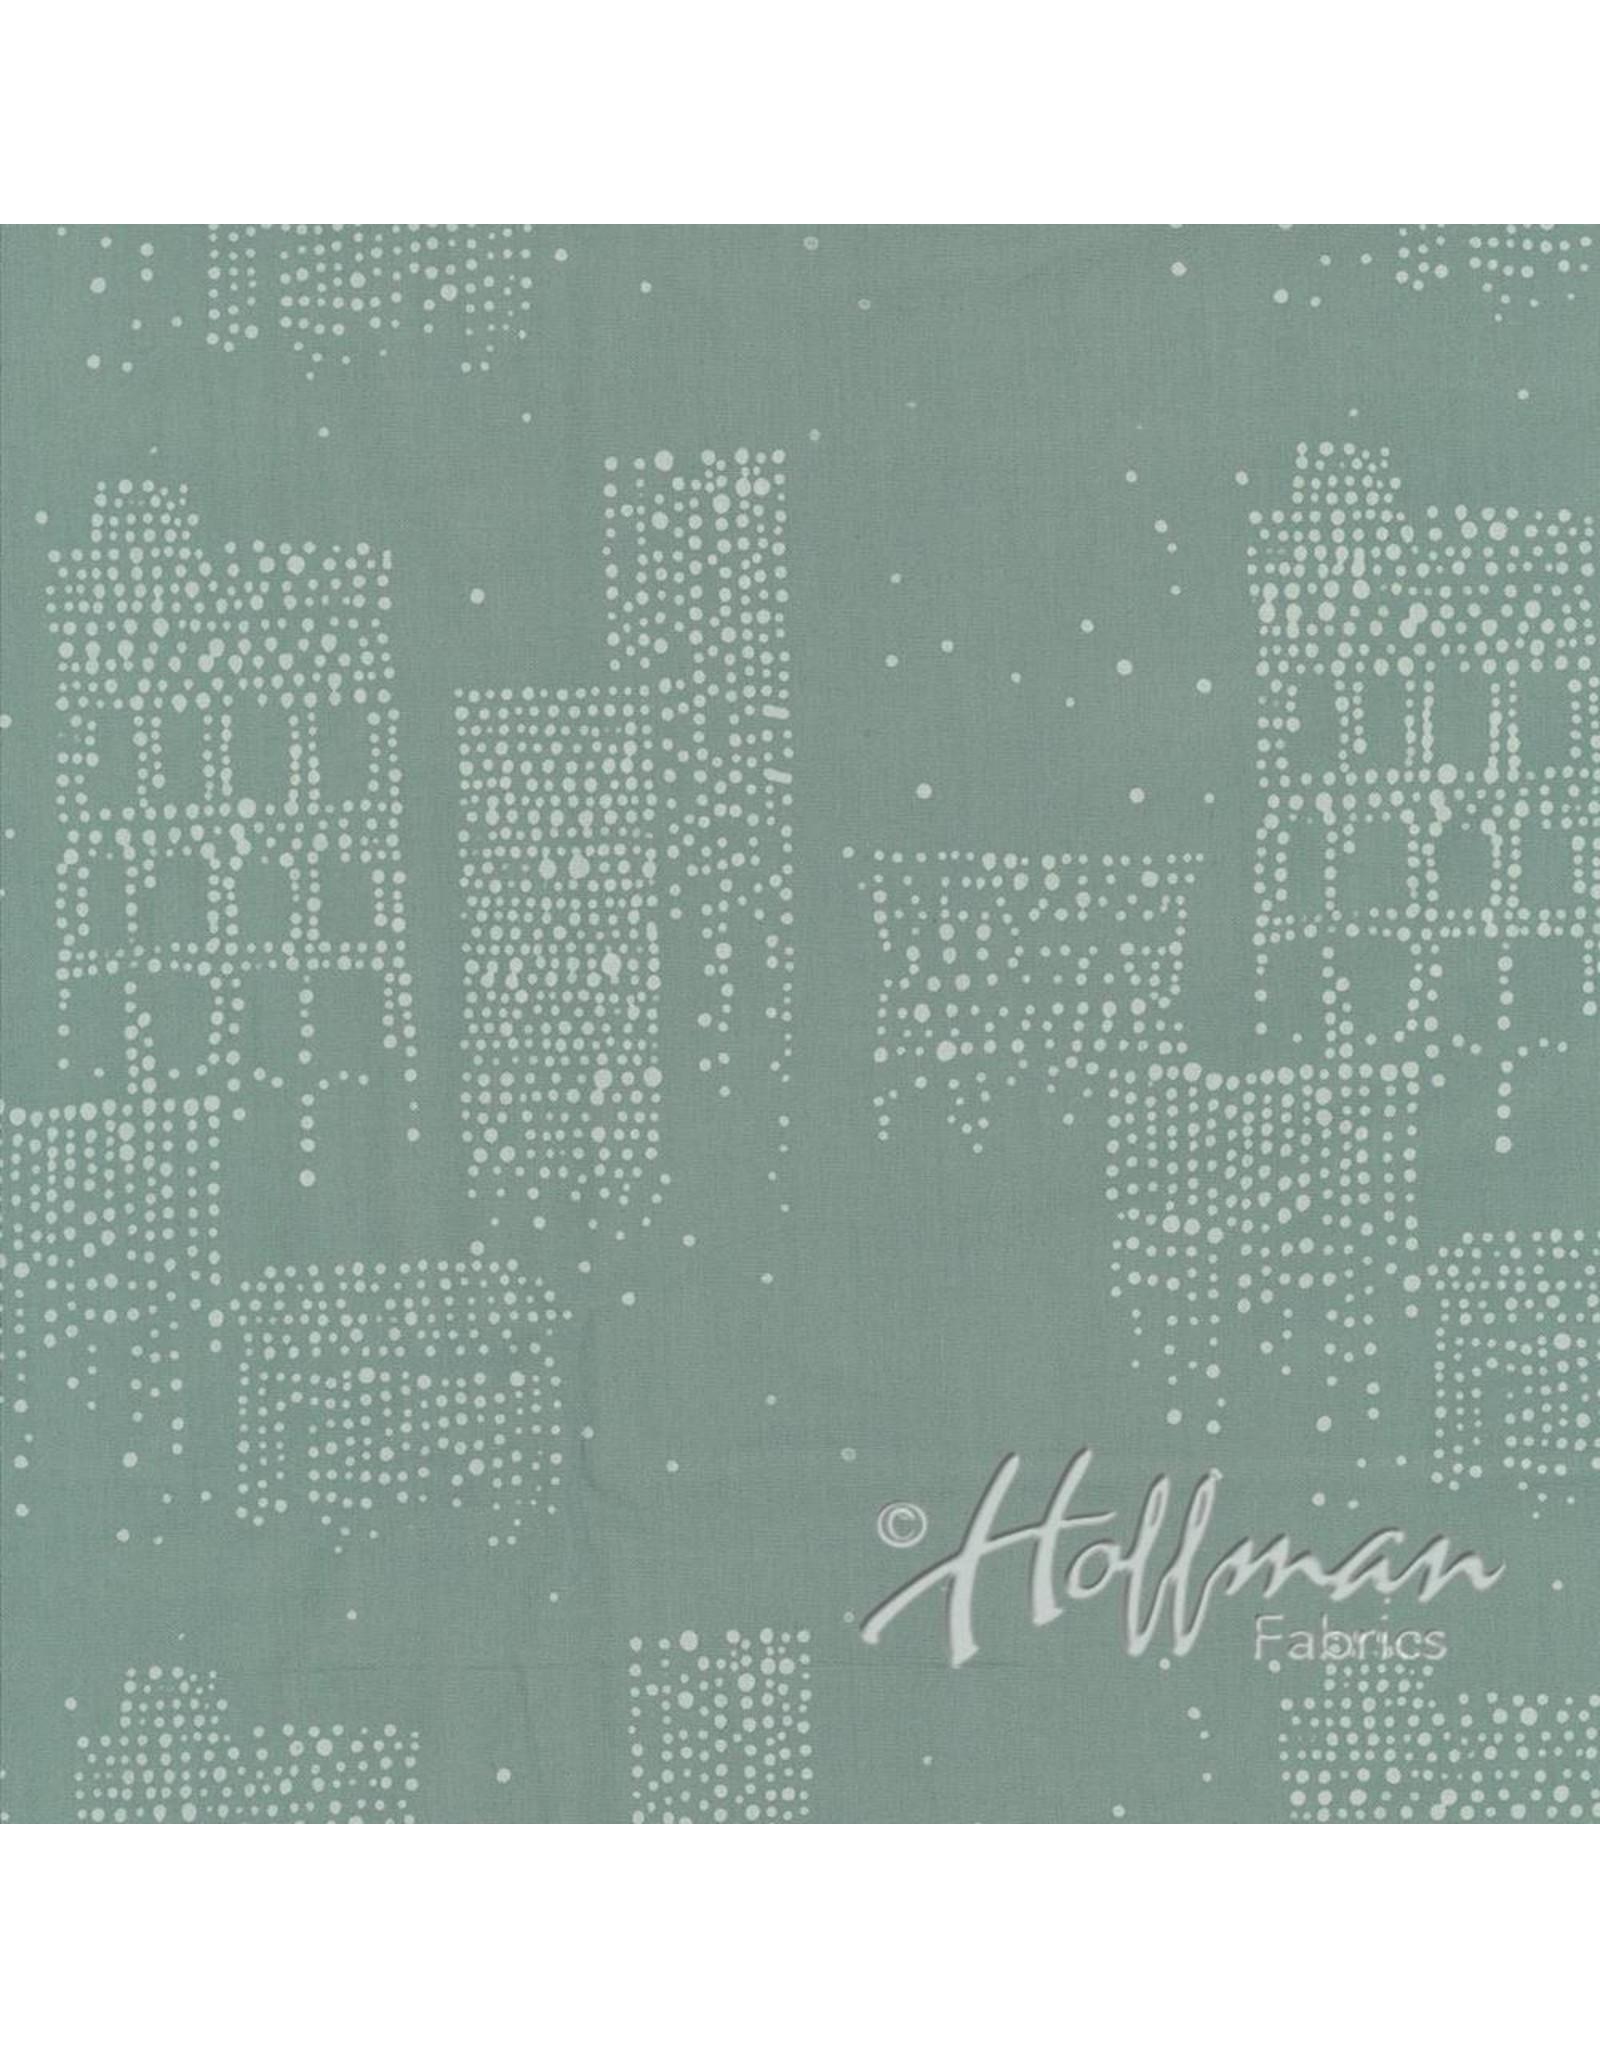 Me+You by Hoffman Fabrics Indah Batiks - 165-Marlin